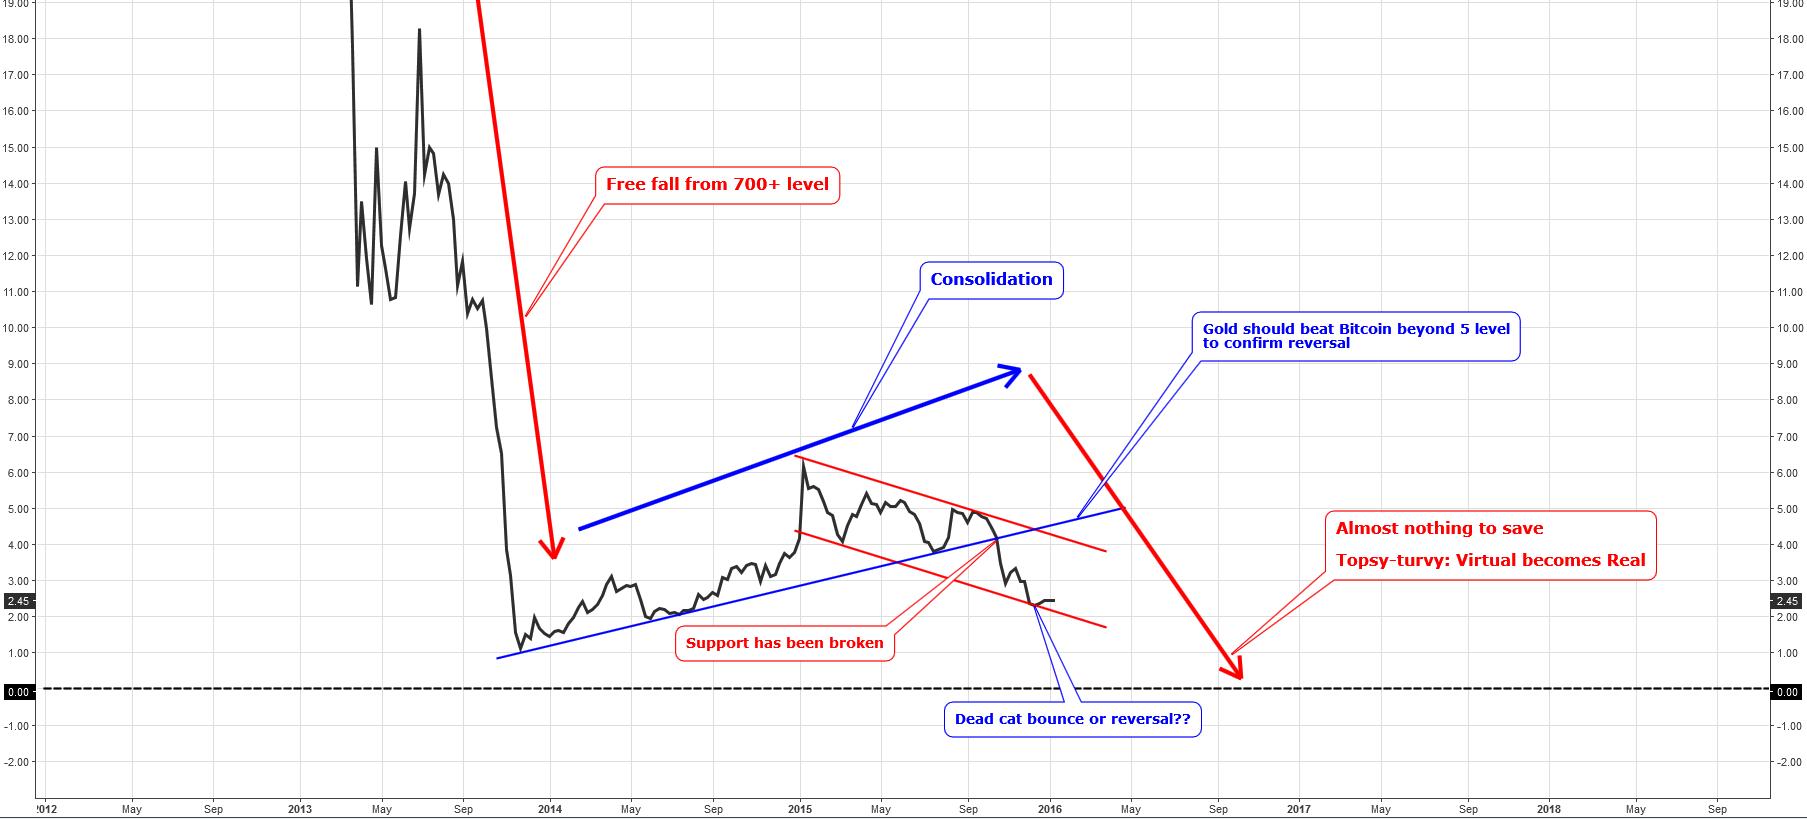 Gold/Bitcoin ratio chart